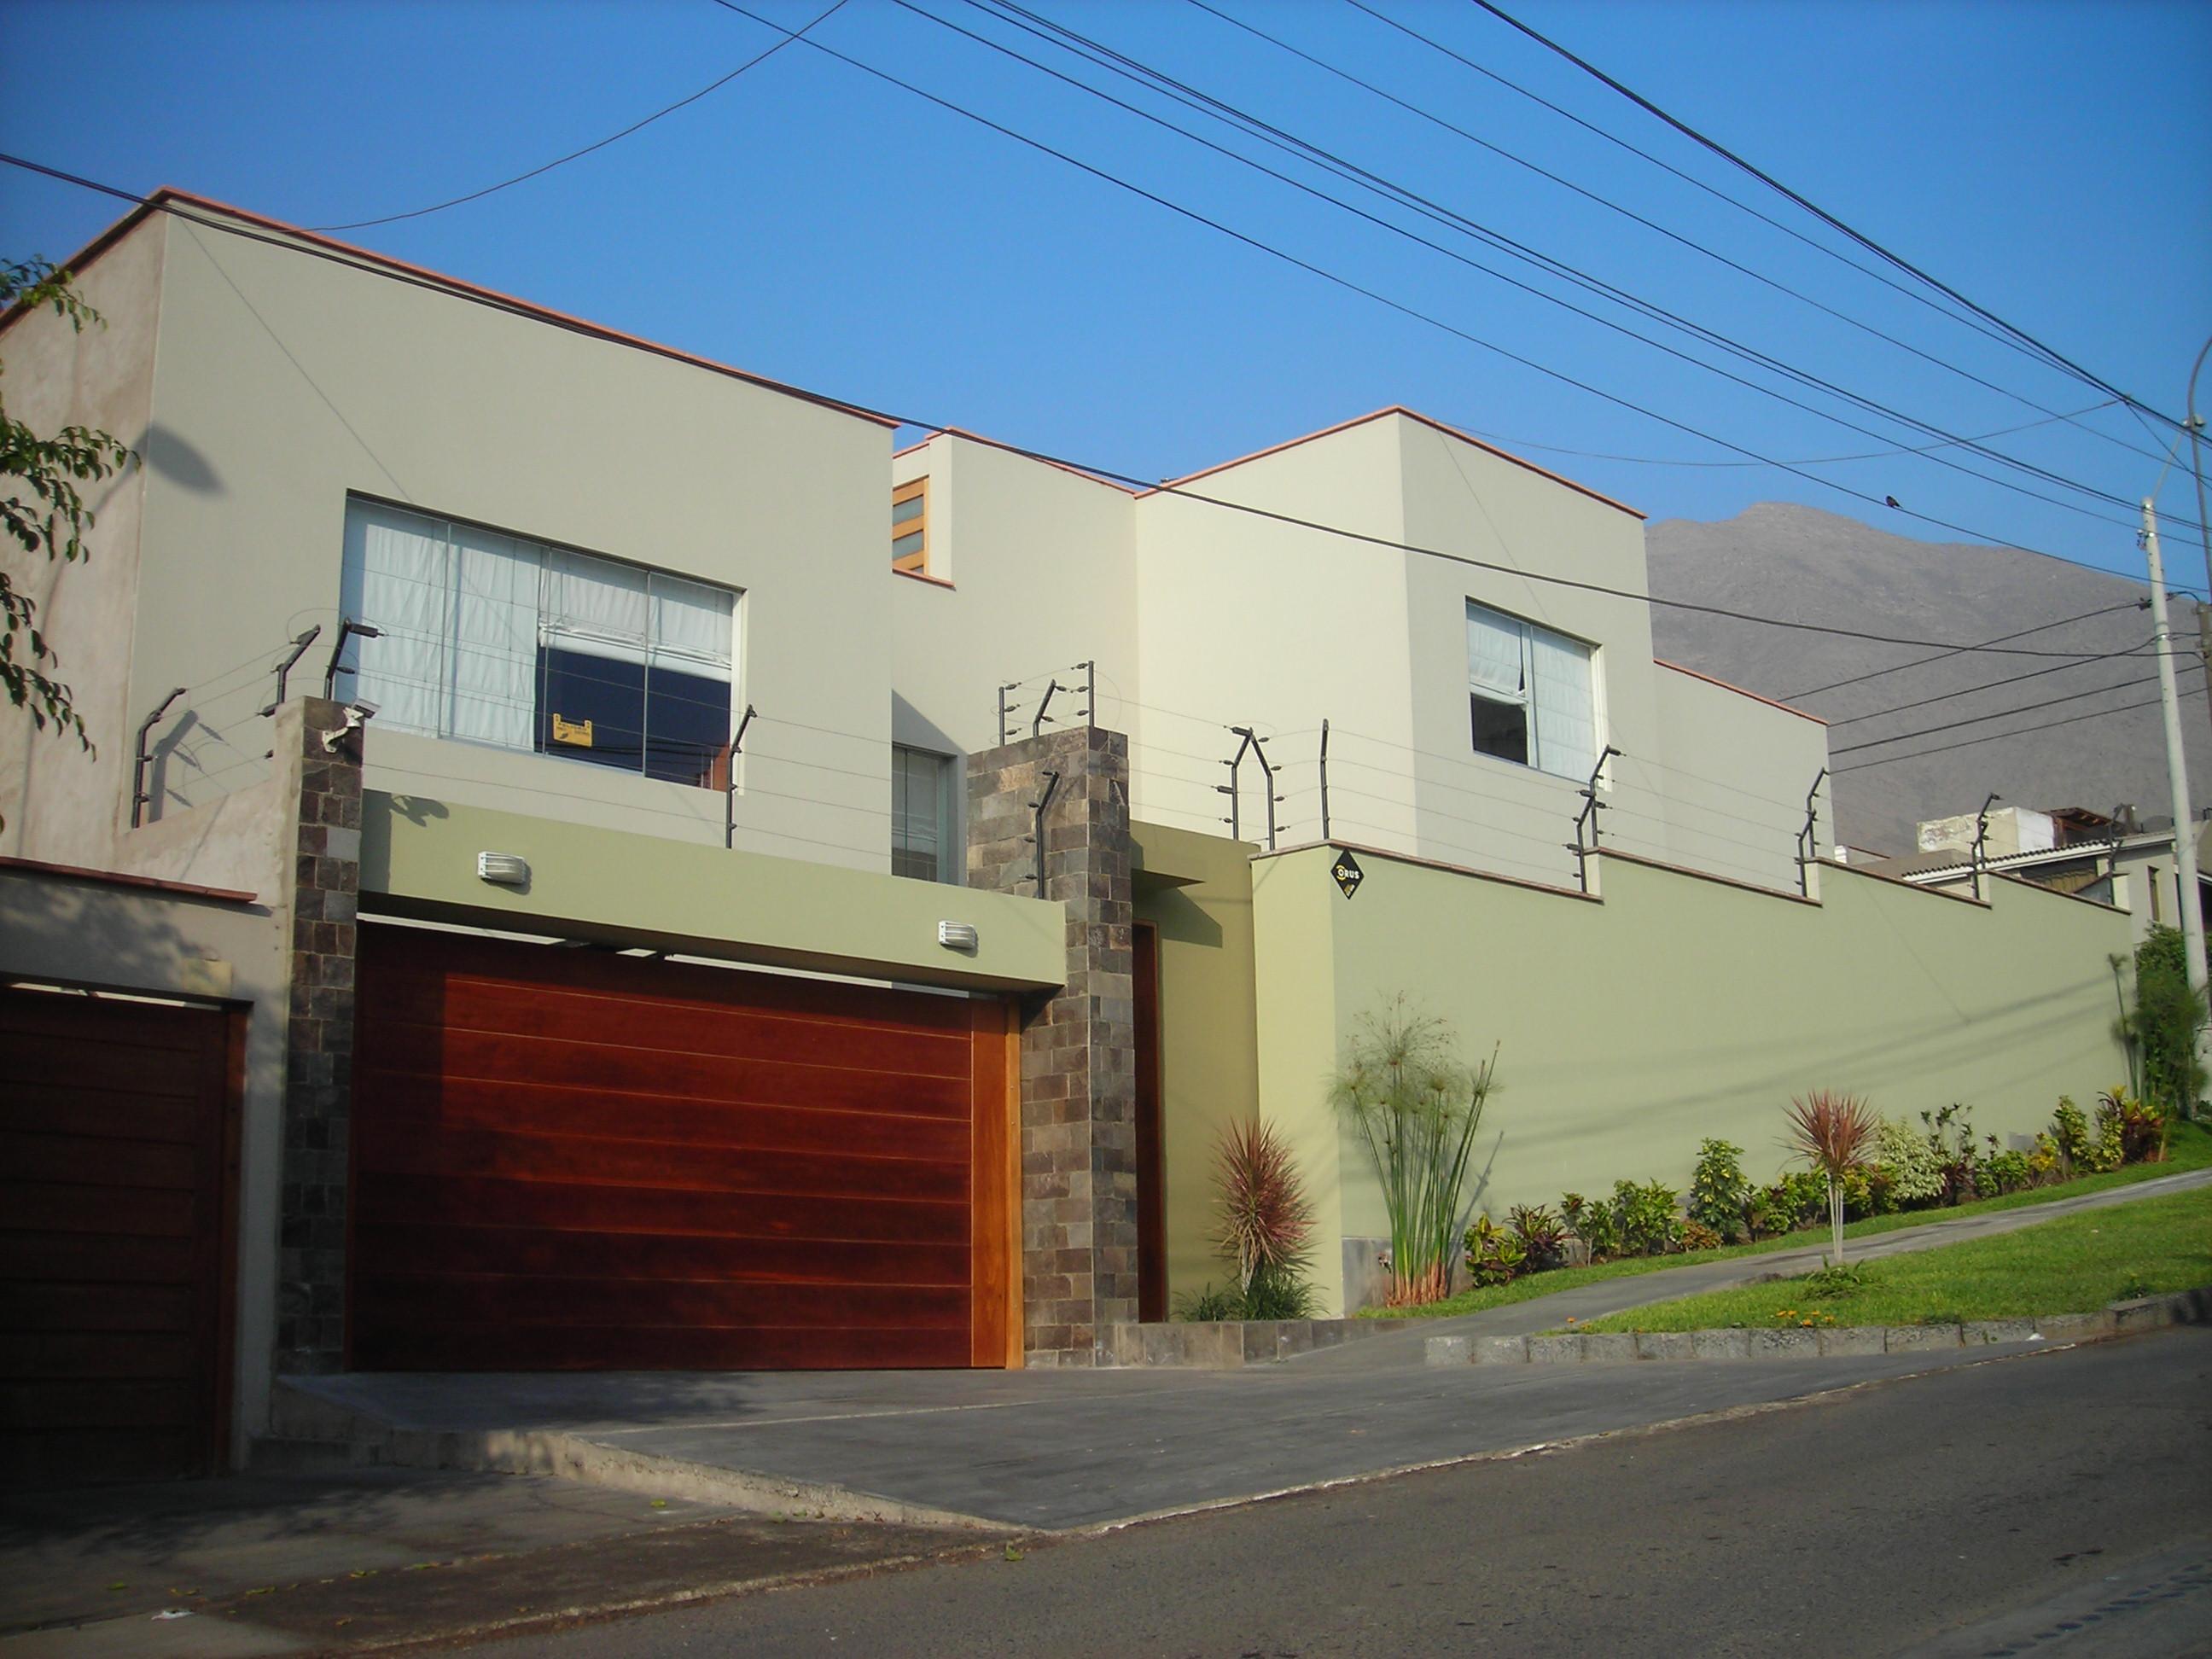 Revista de arquitectura y dise o peruarki casa roque - Arquitectura y diseno de casas ...